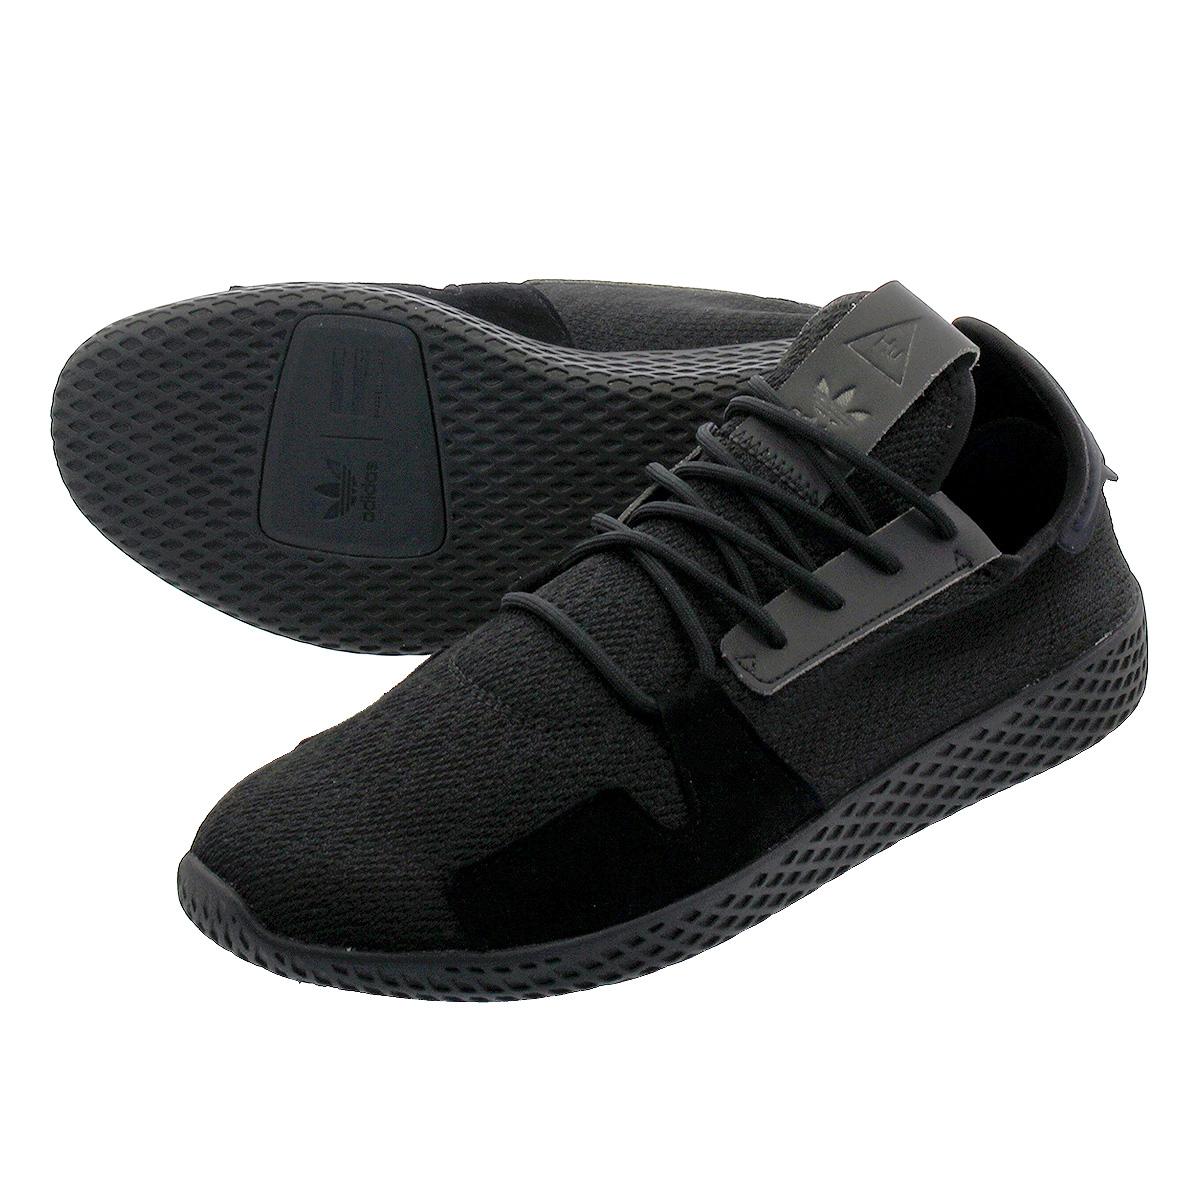 adidas PW TENNIS HU V2 【adidas Originals x PHARRELL WILLIAMS】 アディダス ファレル ウィリアムス テニス HU V2 CORE BLACK/CARBON/RUNNING WHITE db3326